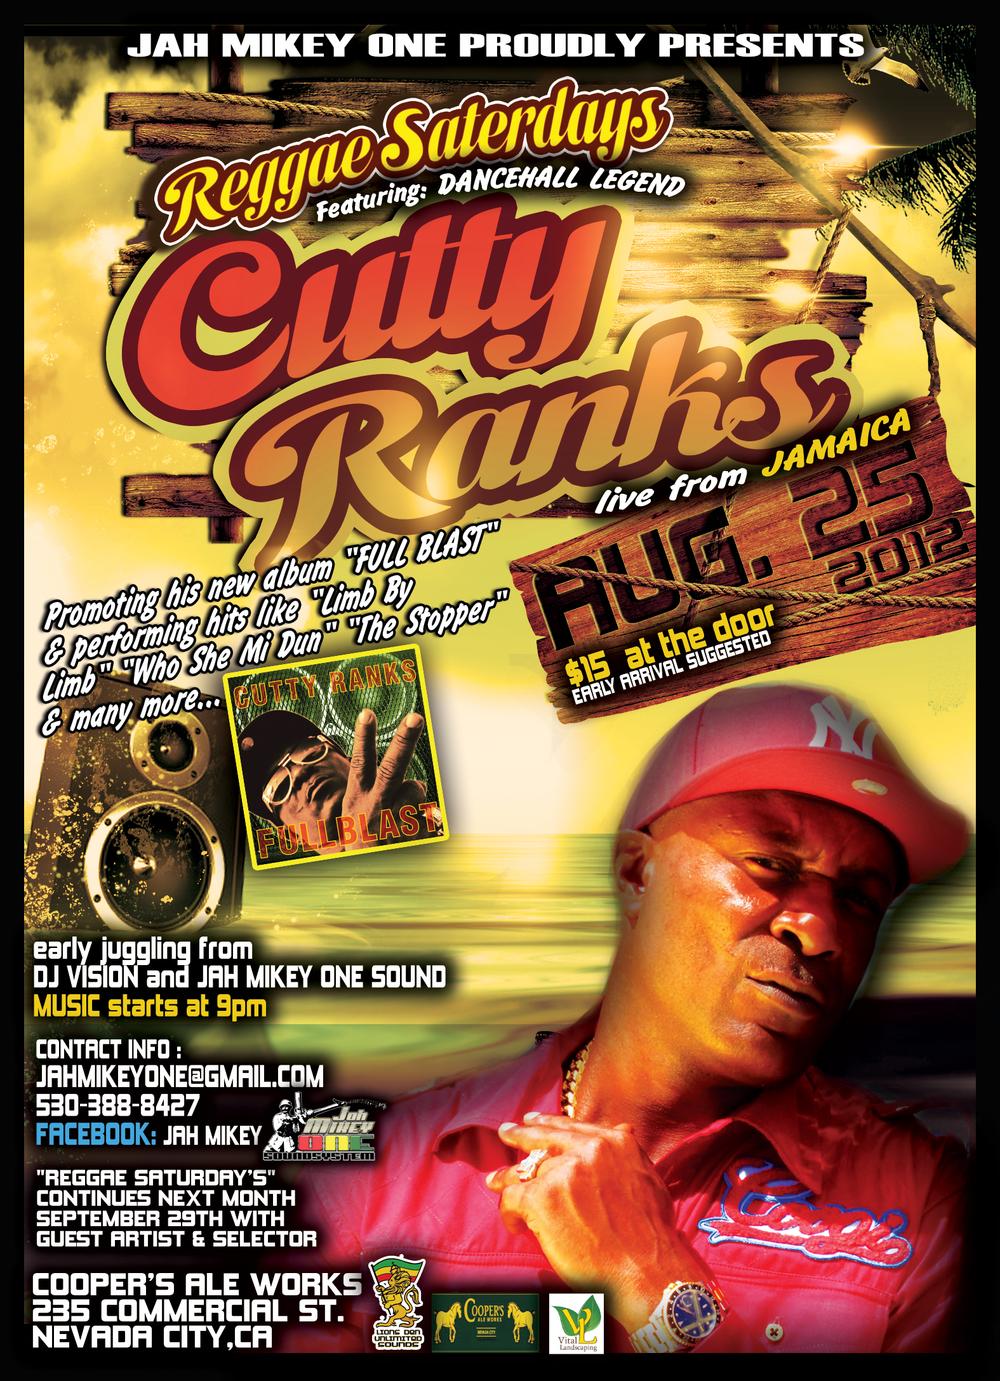 Jah-Flyer--Reggae-Sats---Aug-25th.jpg